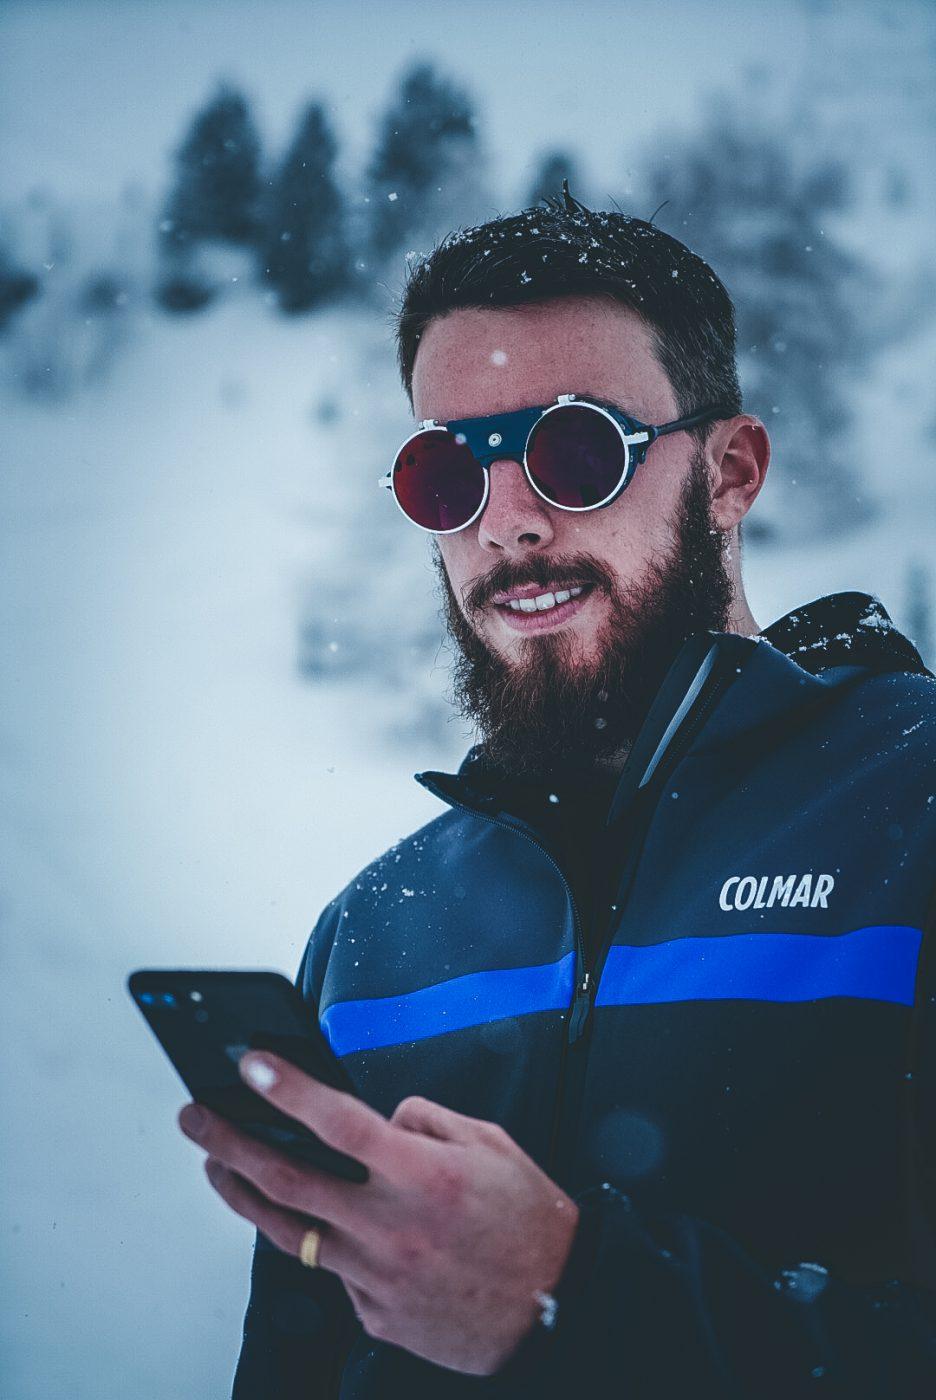 Colmar, Colmarsports ski attire for men